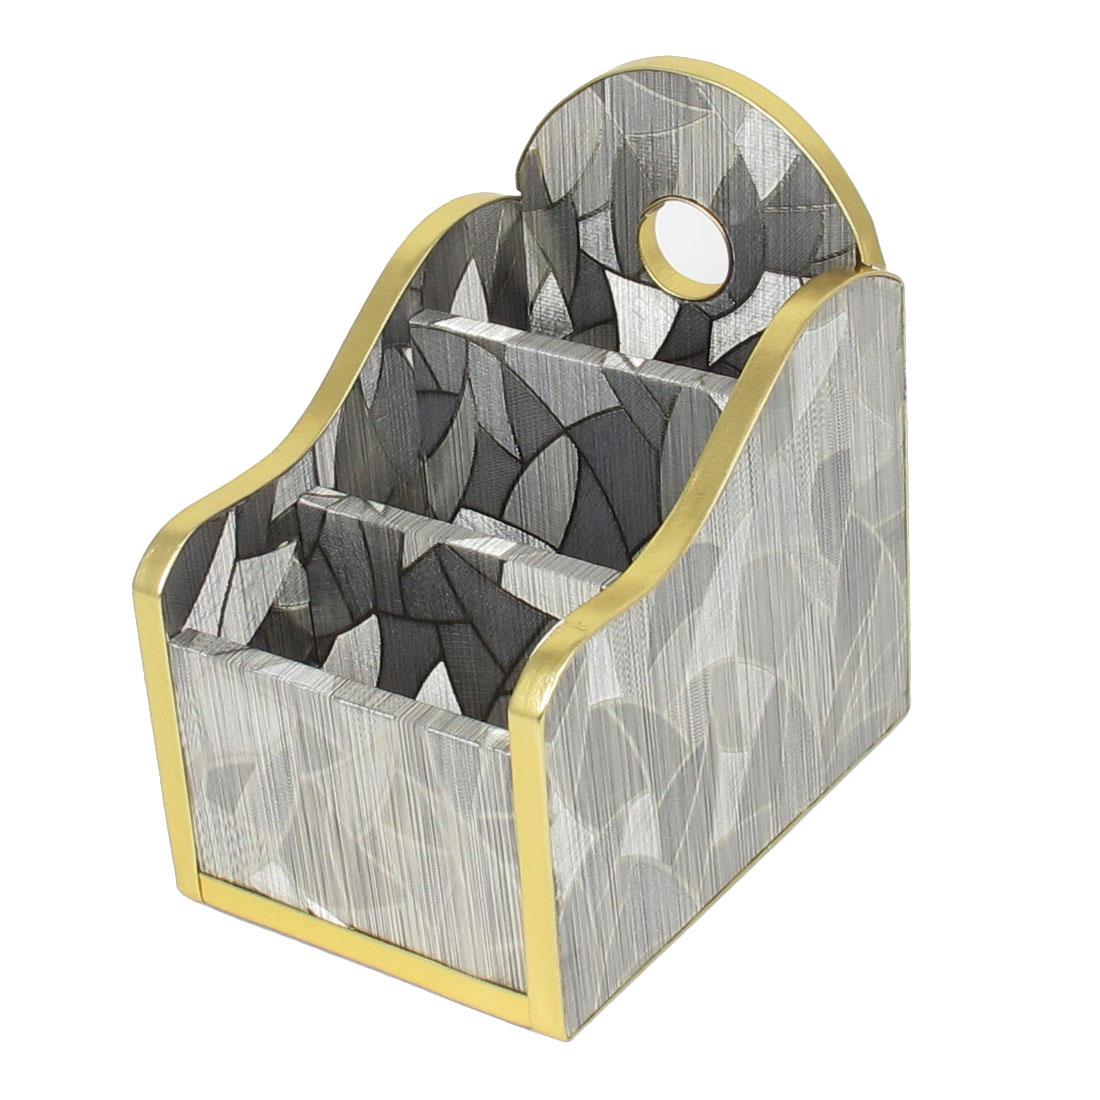 Home Desk Decor Silver Tone 3 Slot Inside Rose Print Wooden Storage Box Holder